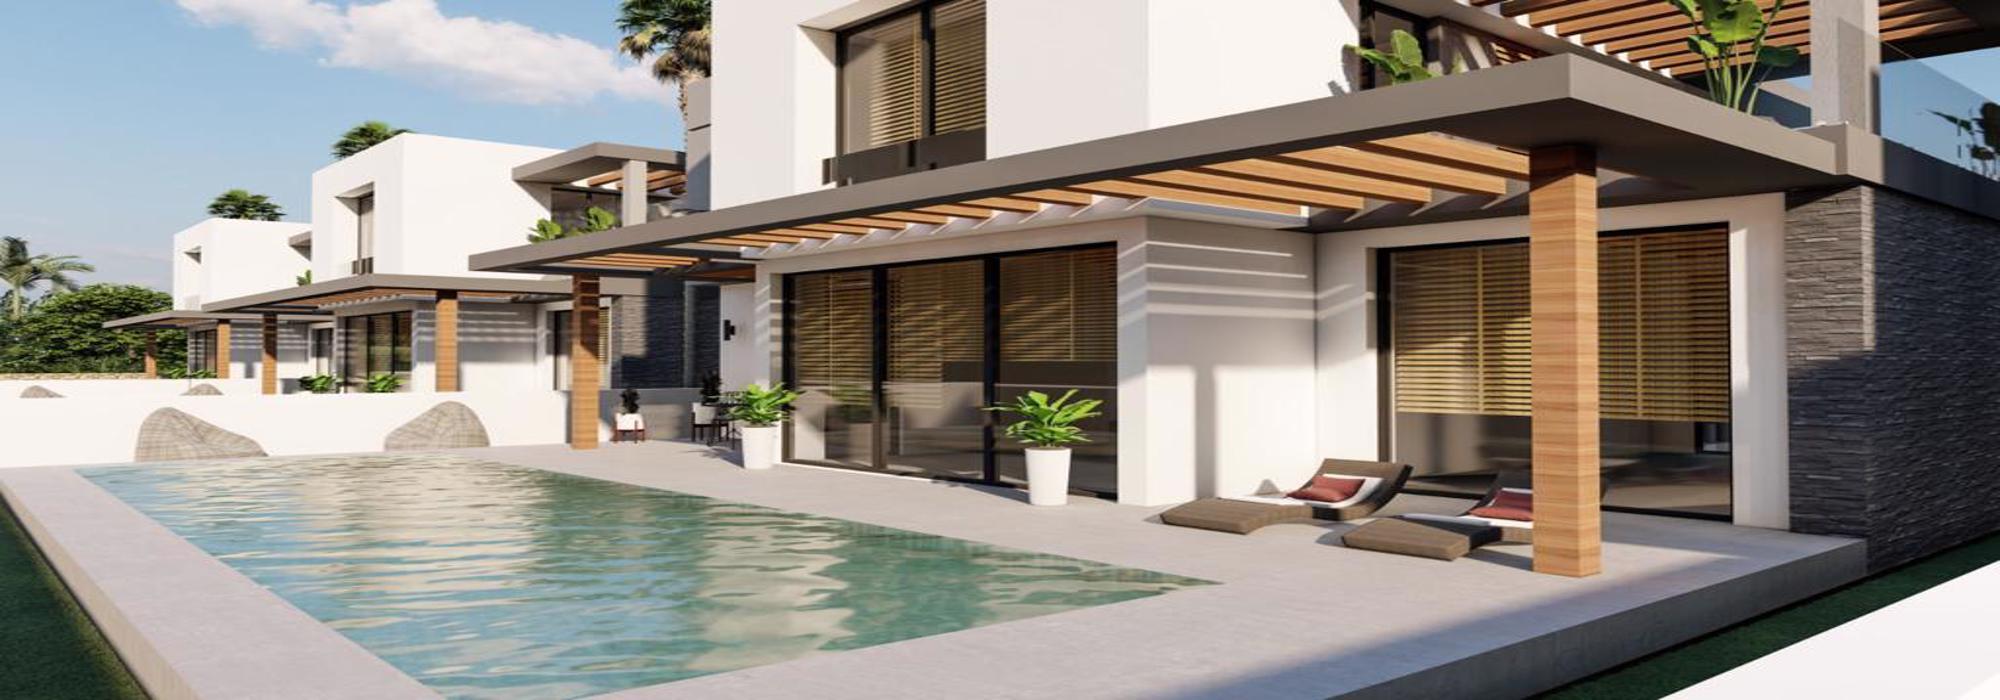 Nice 4 Bedroom Villas For Sale Location Near Seaside Karsiyaka Girne(Sea And Mountain Views)